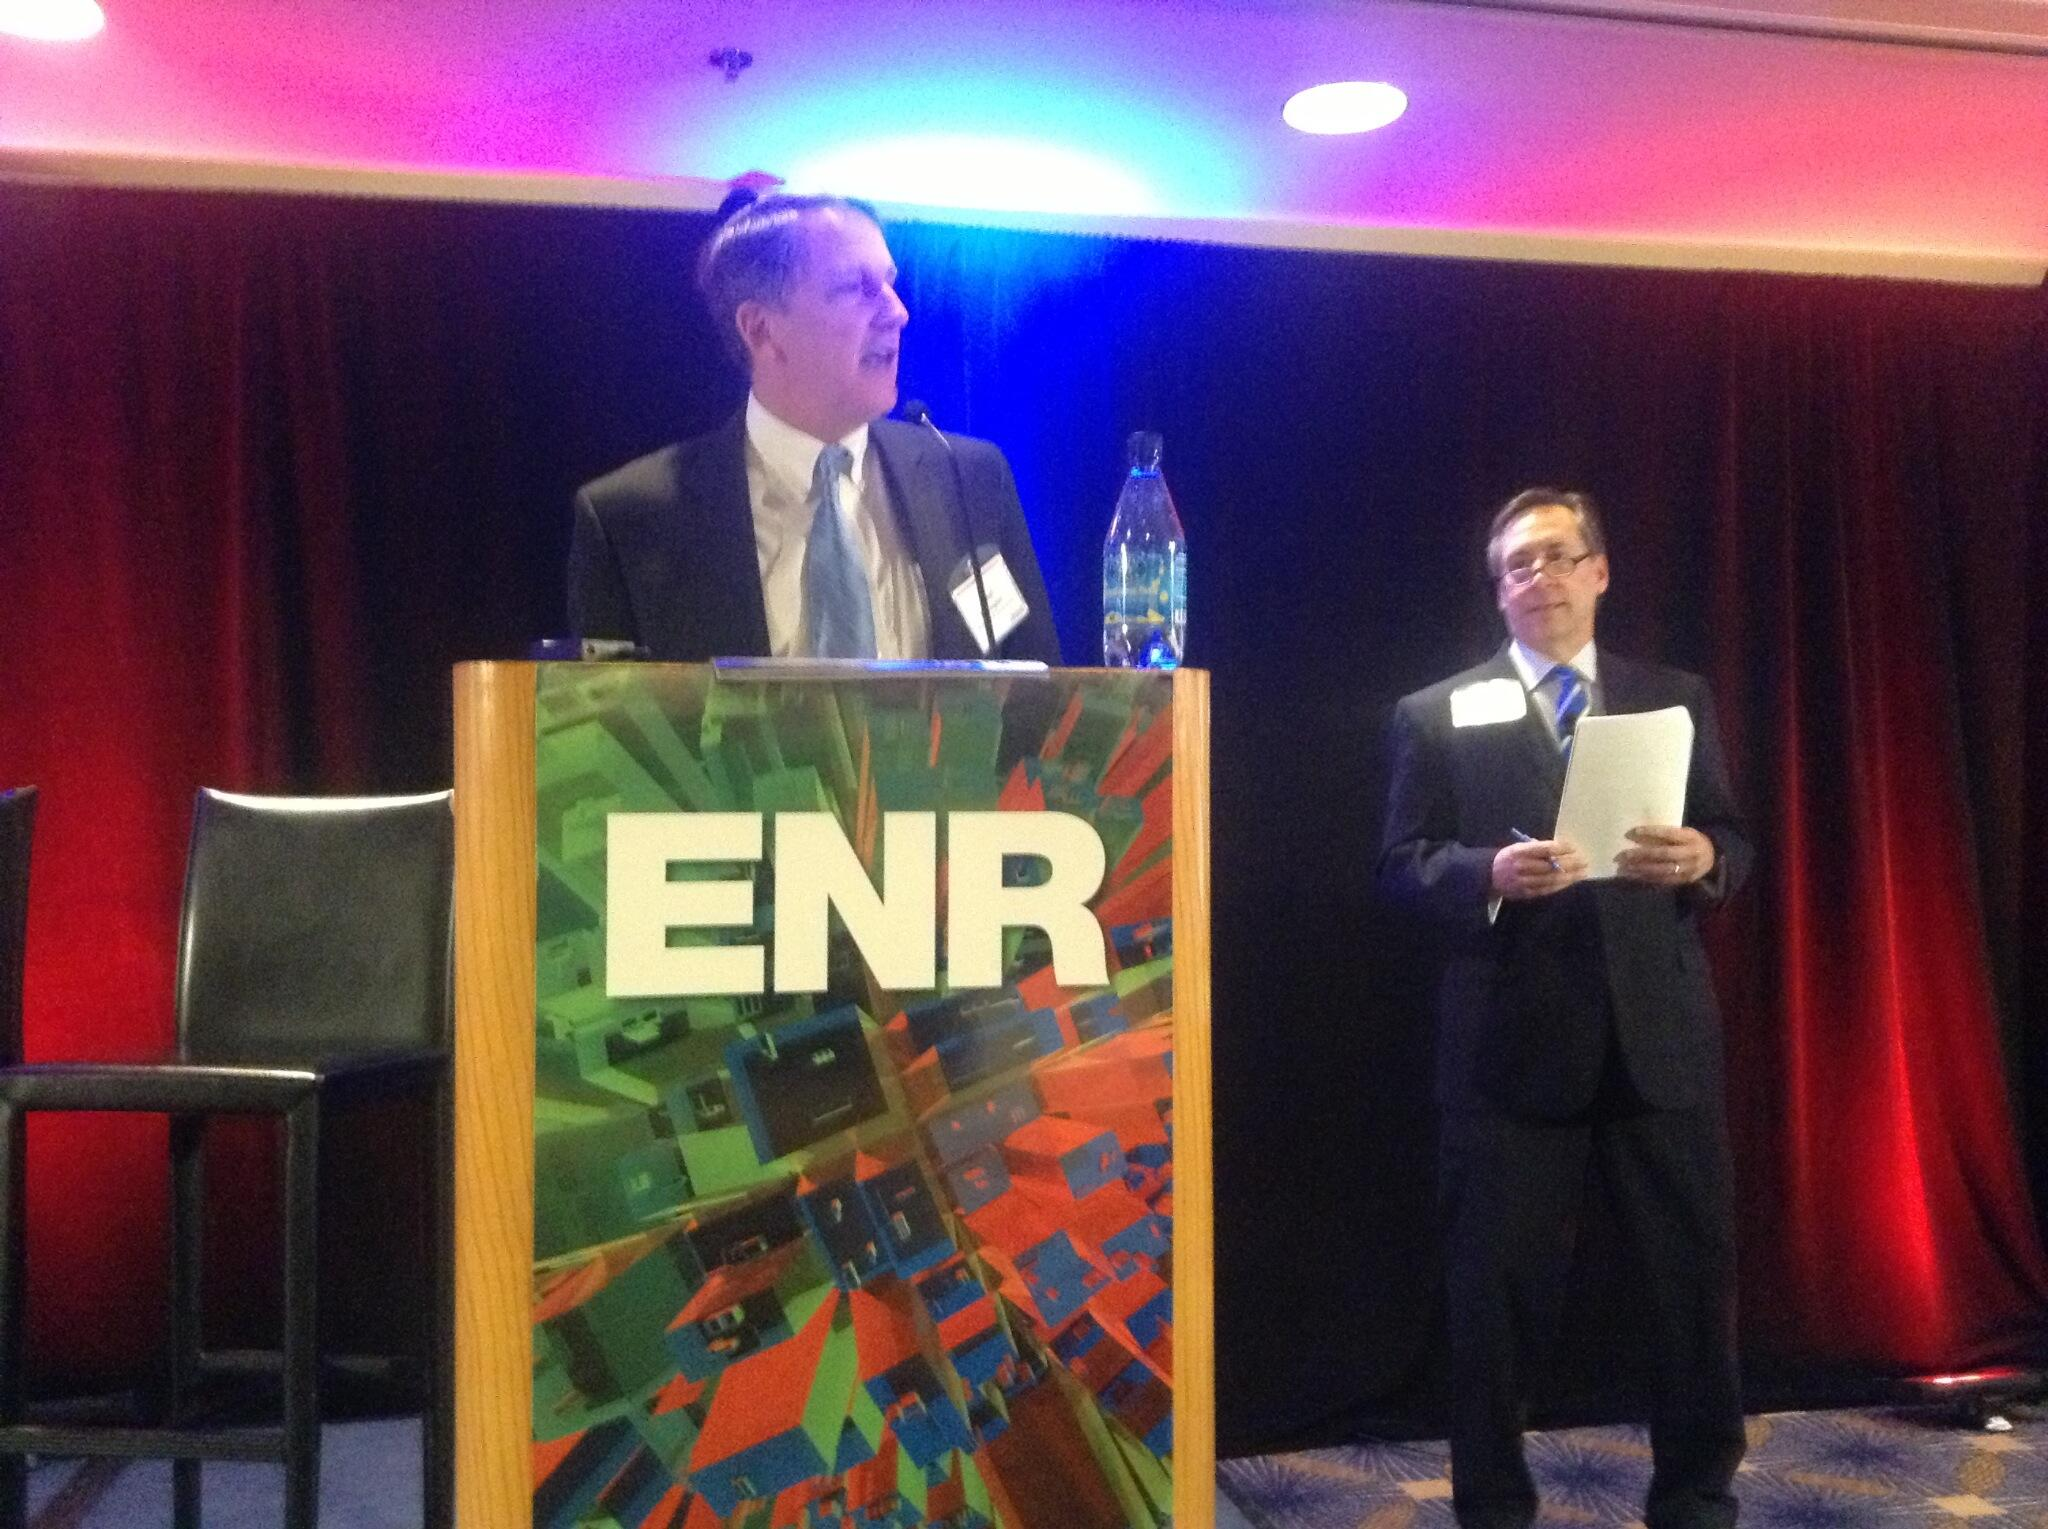 Stephen Jones and Paul Bonington of McGraw Hill kick-off #ENRTECH http://t.co/O5MfA9Sp3D